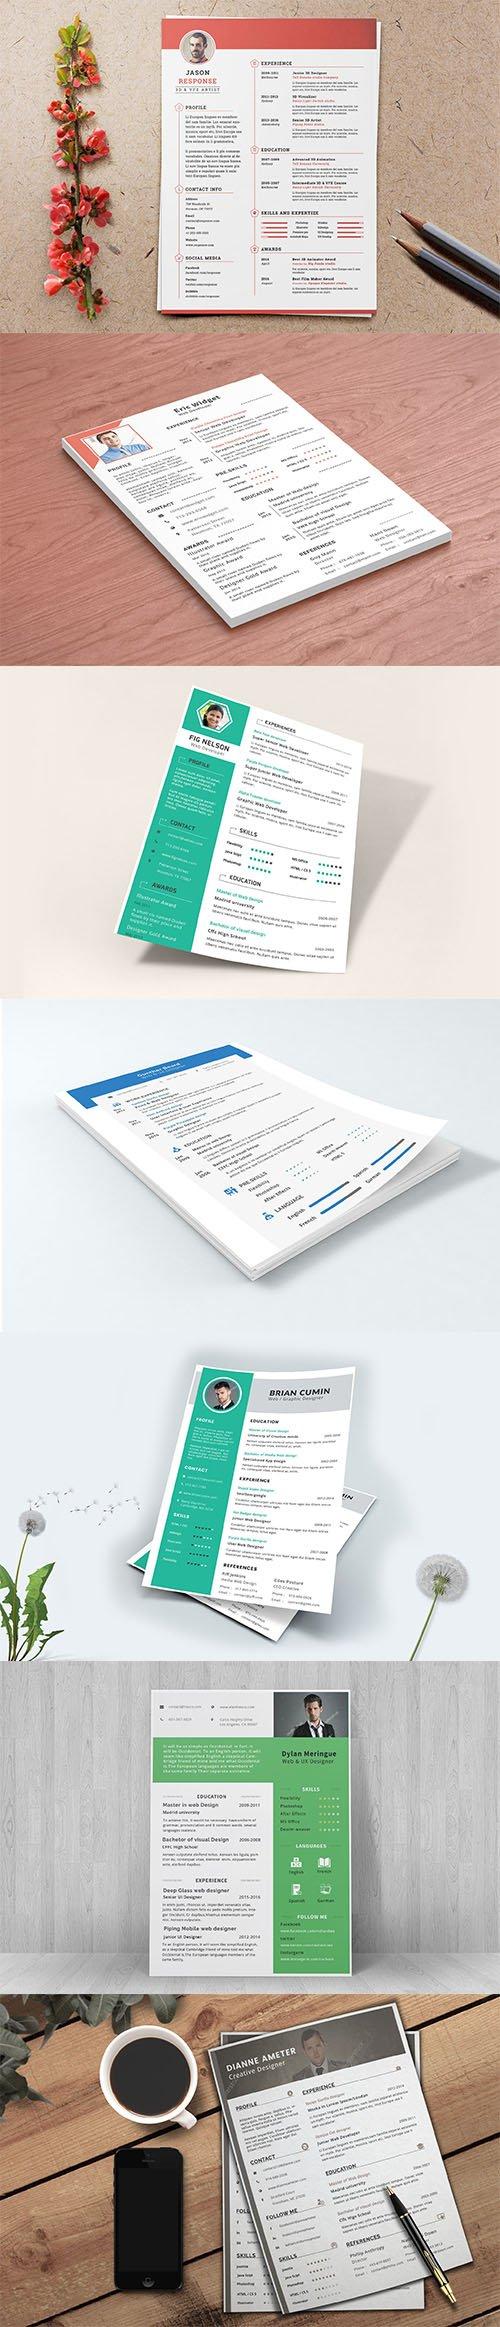 Resume / CV Template PSD Set vol2